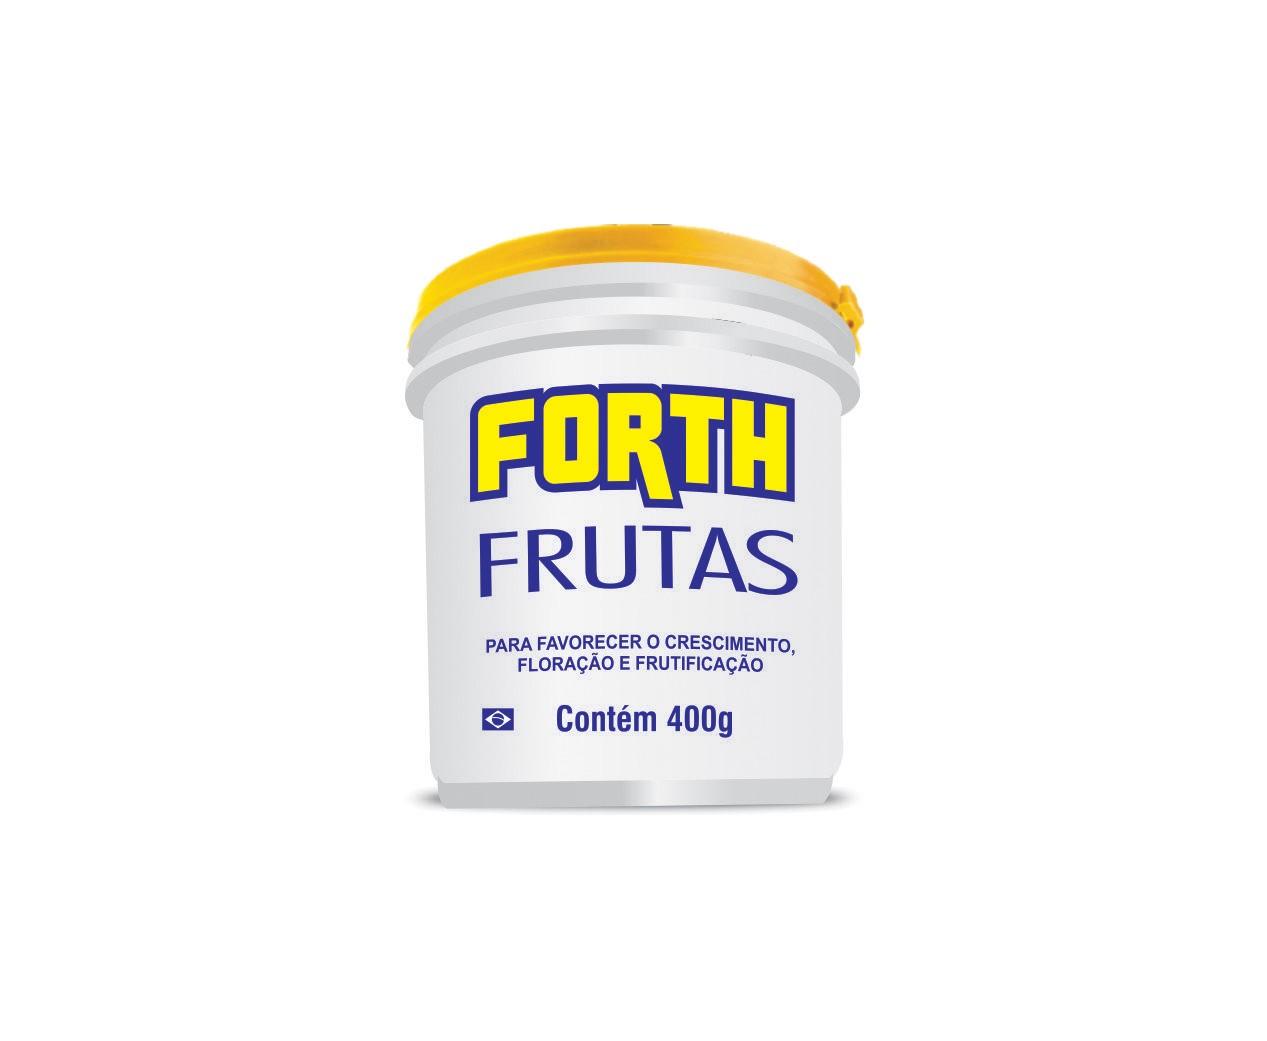 Fertilizante para plantas Forth Frutas 400g  - Loja Raiz